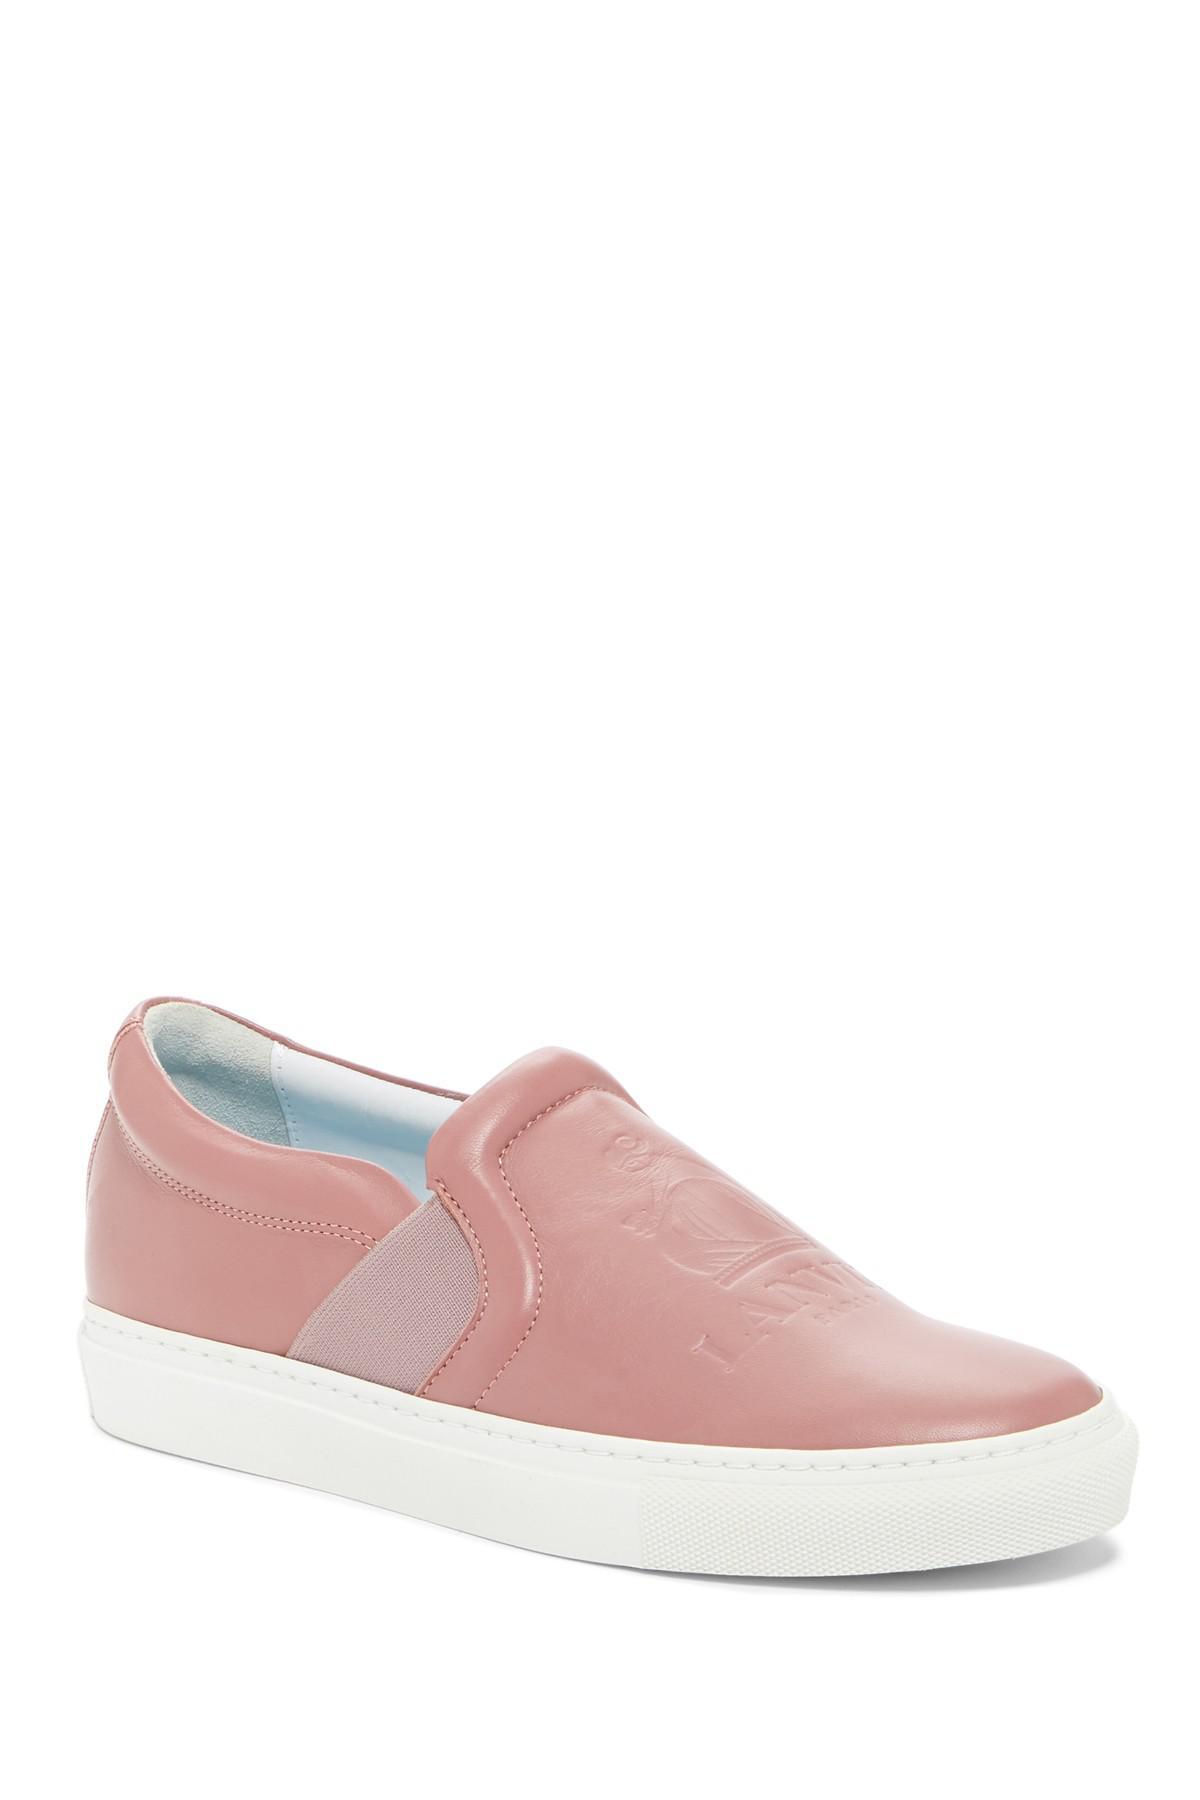 Lyst - Lanvin Embossed Logo Slip-on Sneaker in Pink